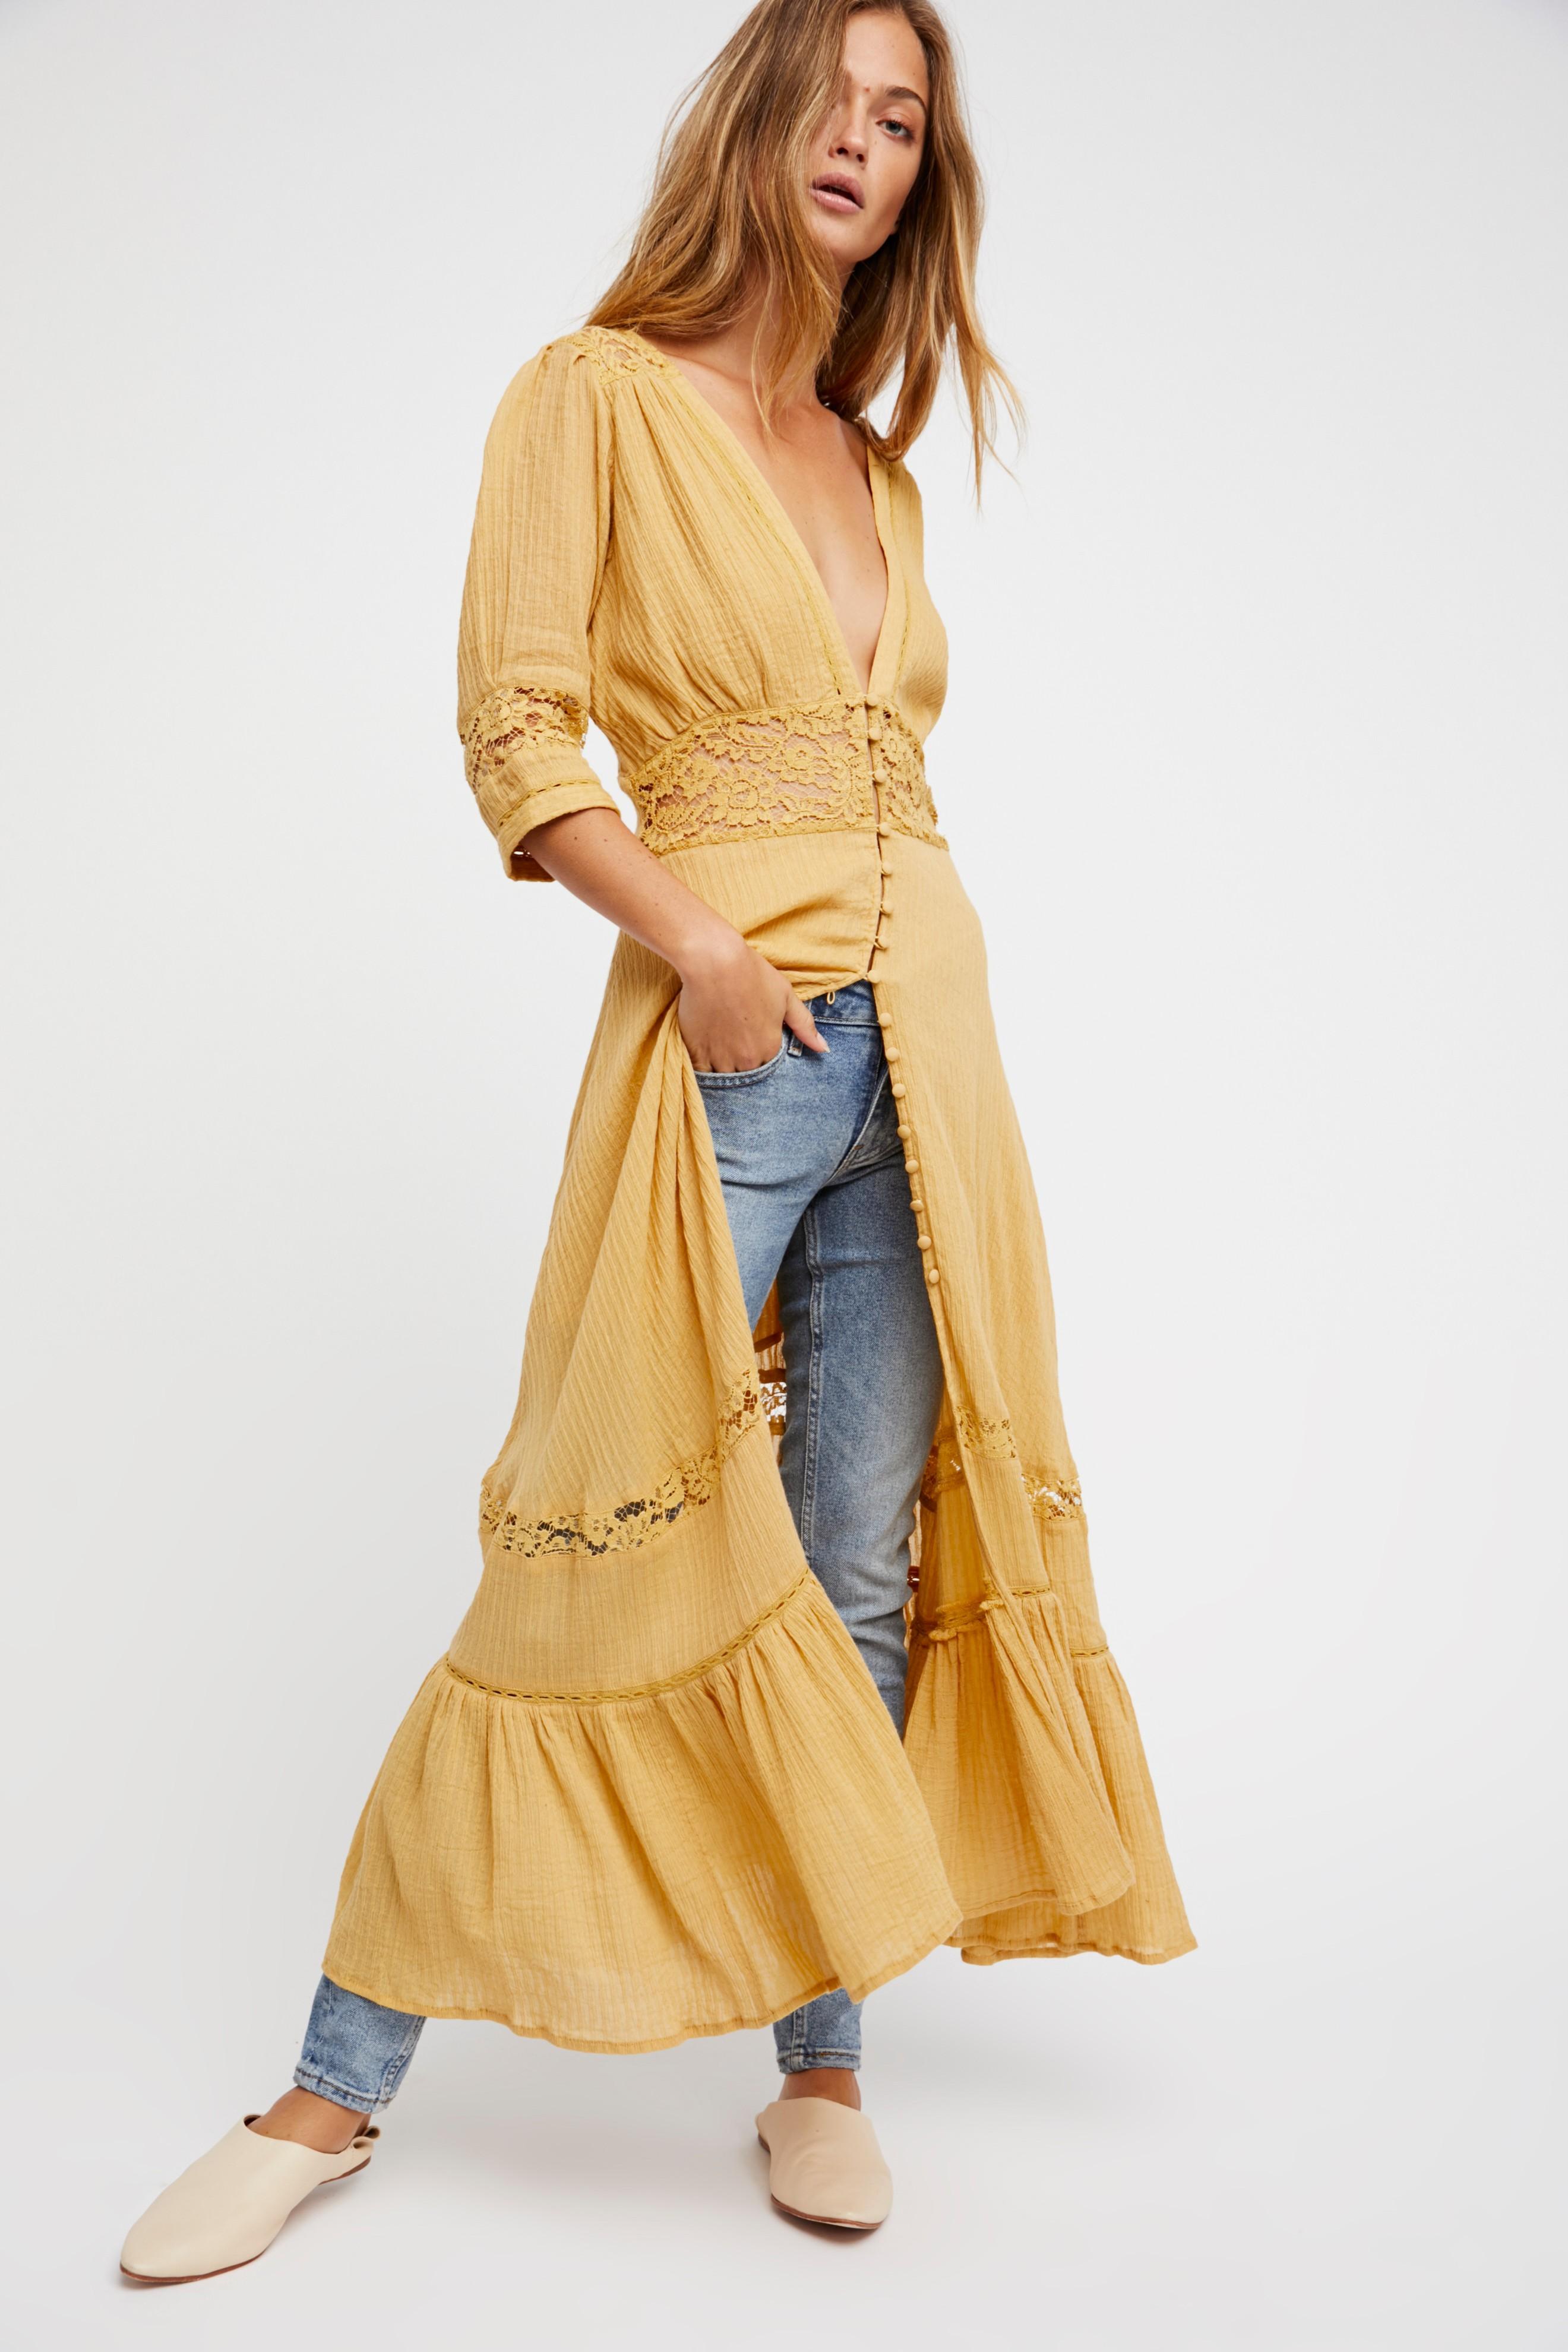 Shop the Susanna Dress